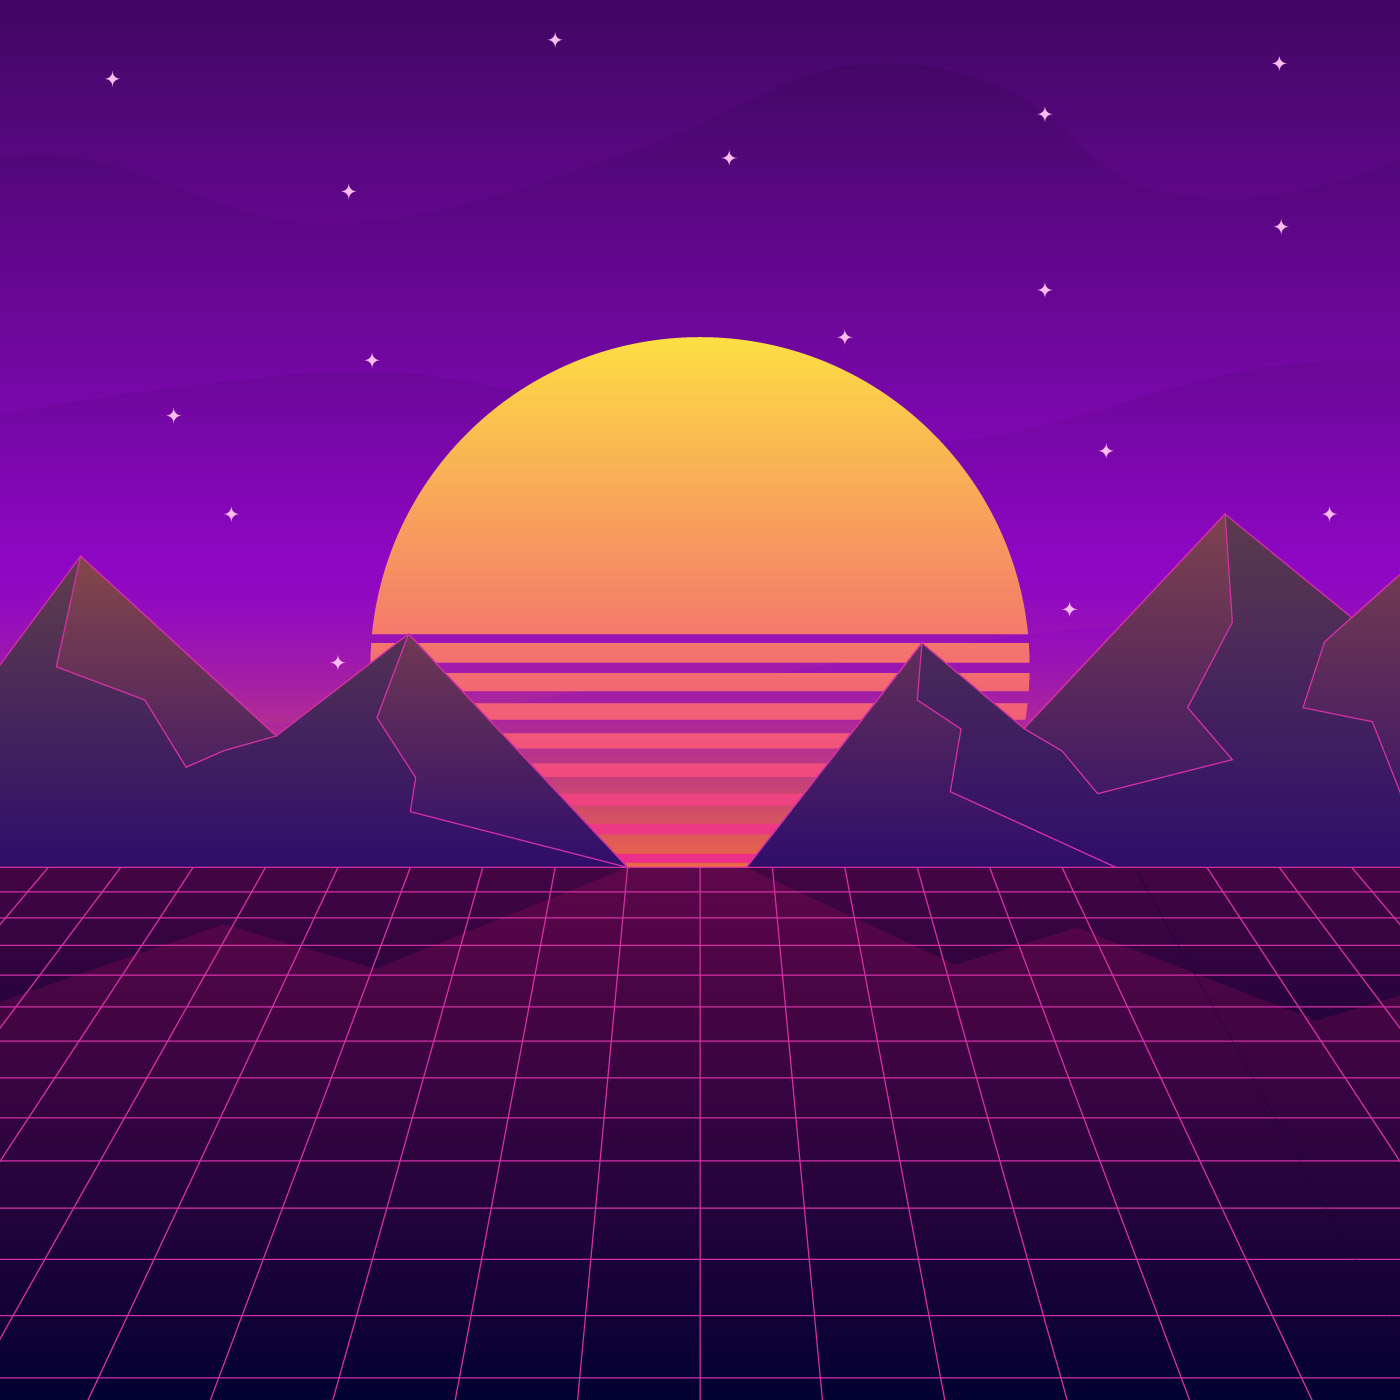 Retro Background Download Free Vectors Clipart Graphics